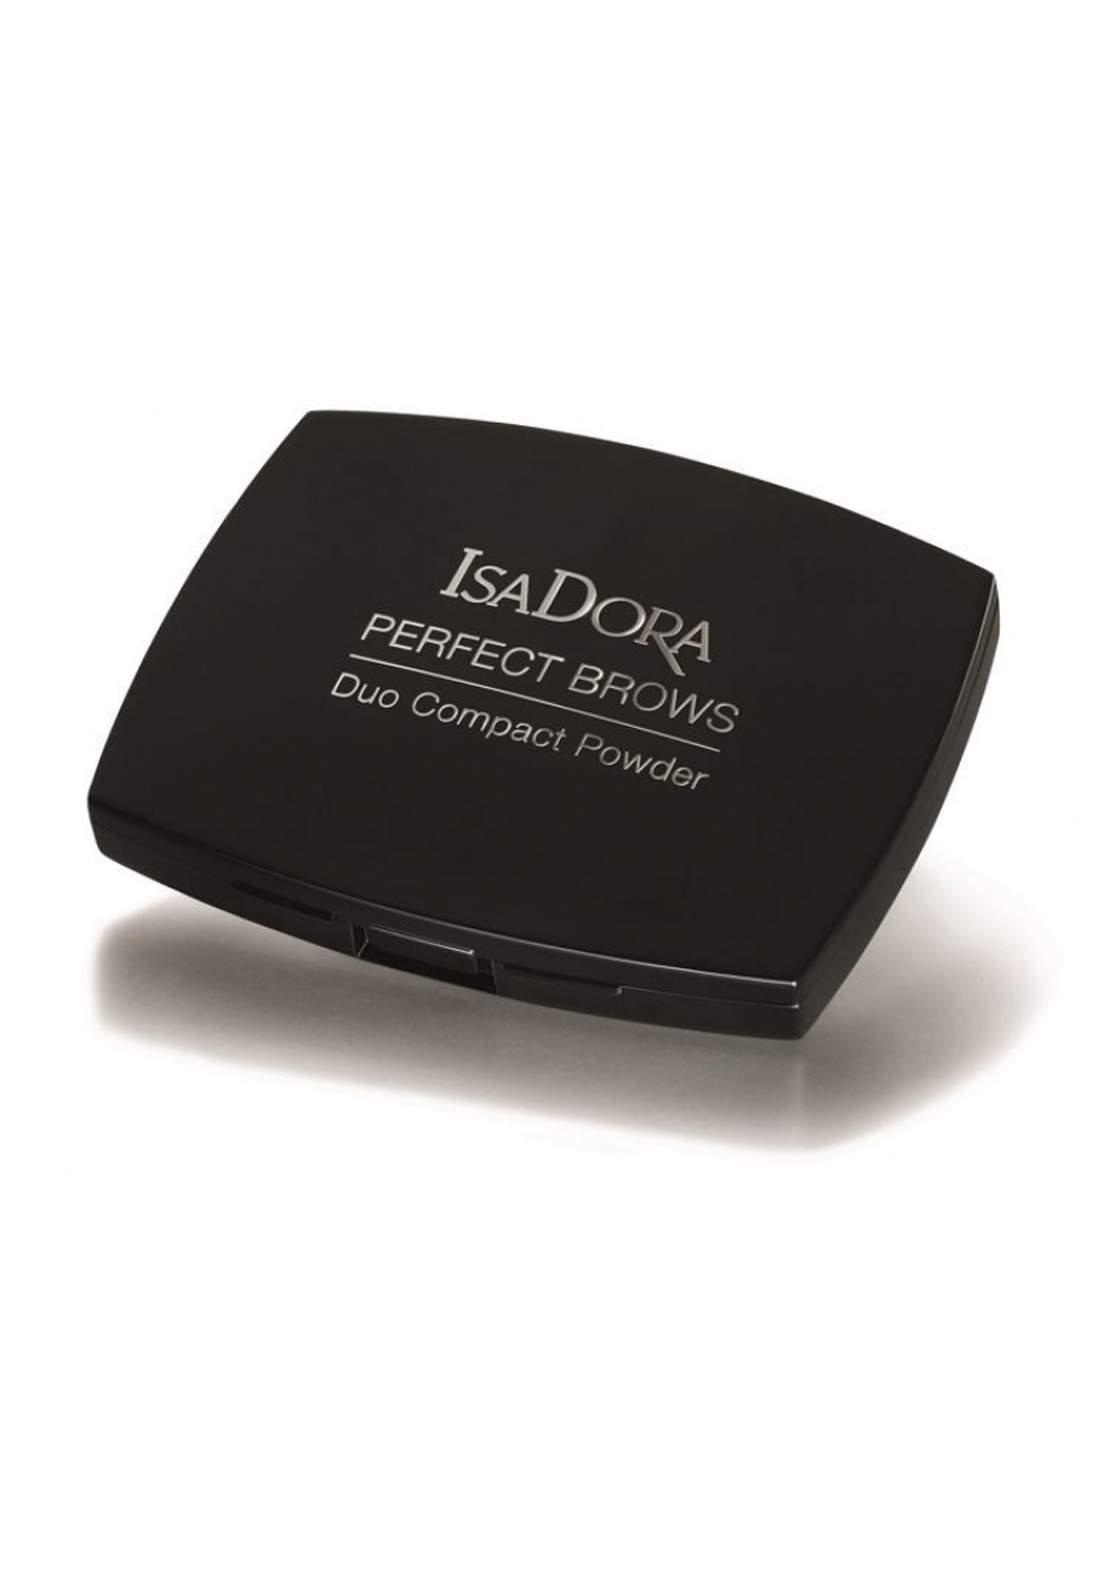 314189 Isadora Perfect Brows Duo Compact Powder - Brown Duo بودرة حواجب